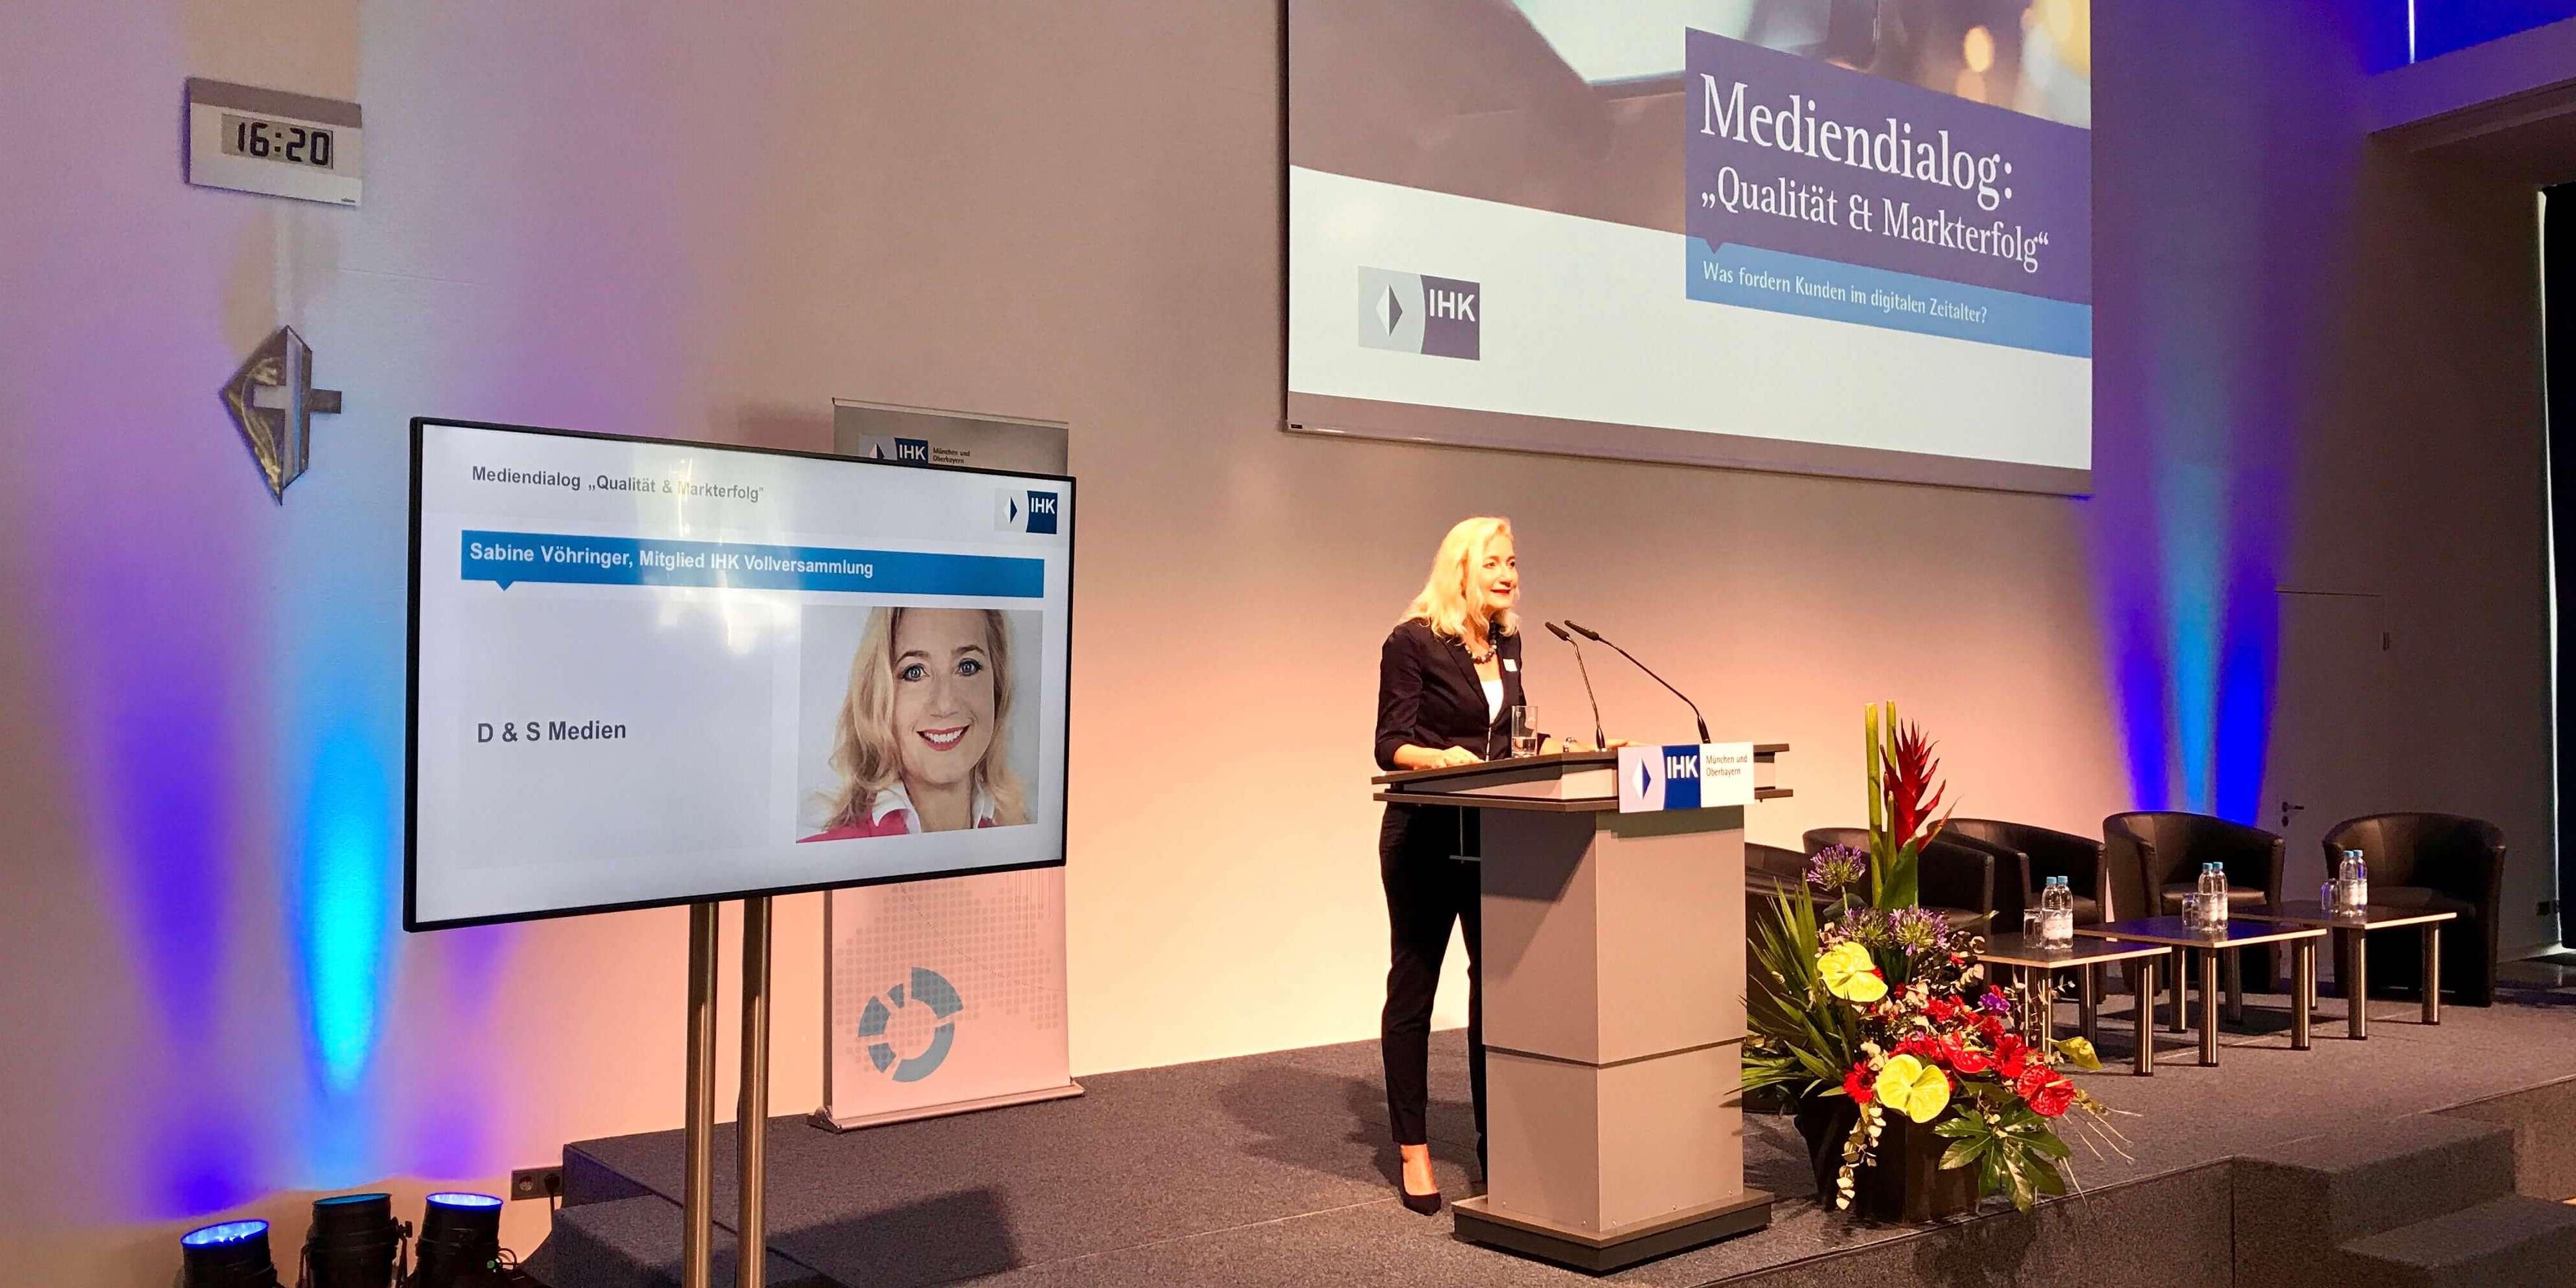 Sabine-Voehringer_Mediendialog2-2